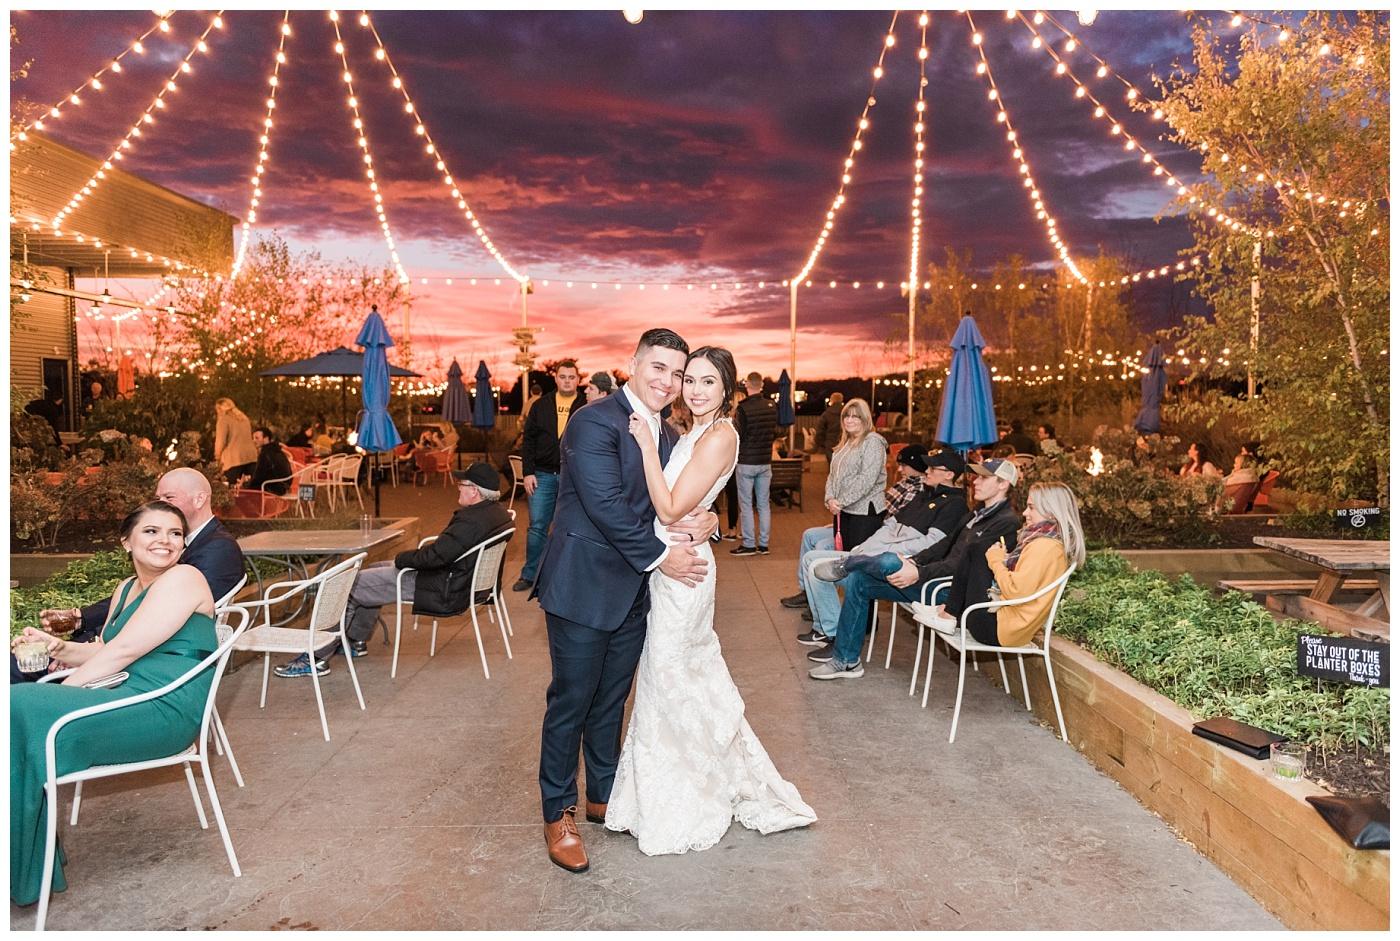 Stephanie Marie Photography Unitarian Universalist Society Church Ceremony Hotel Kirkwood Reception Cedar Rapids Iowa City Wedding Photographer Sean Madison Moore_0087.jpg